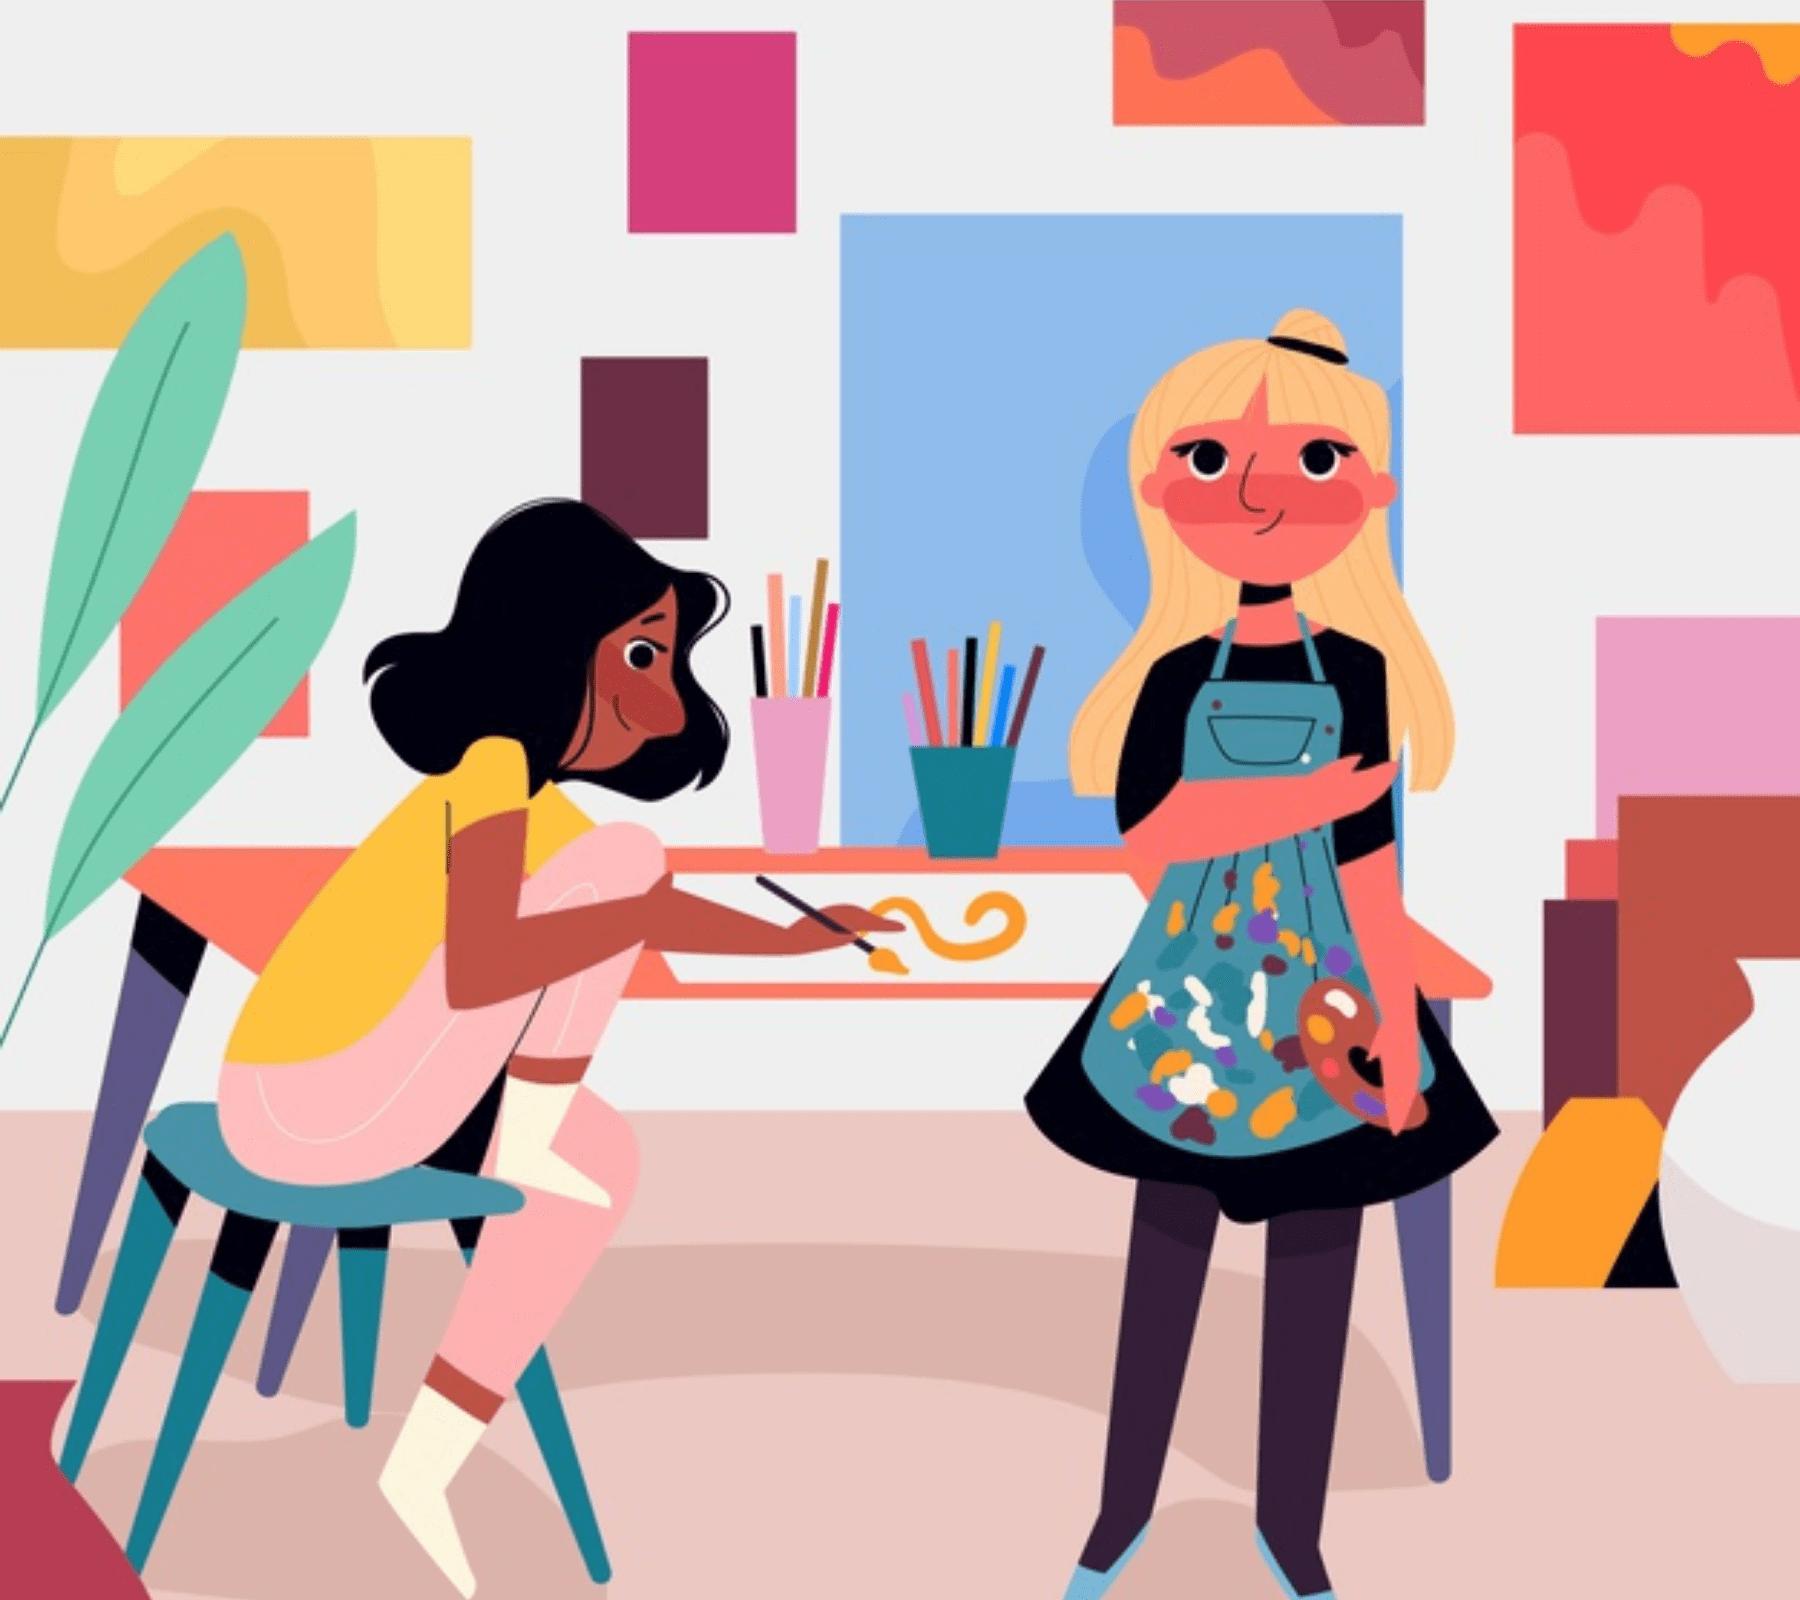 Mujeres artistas pintando